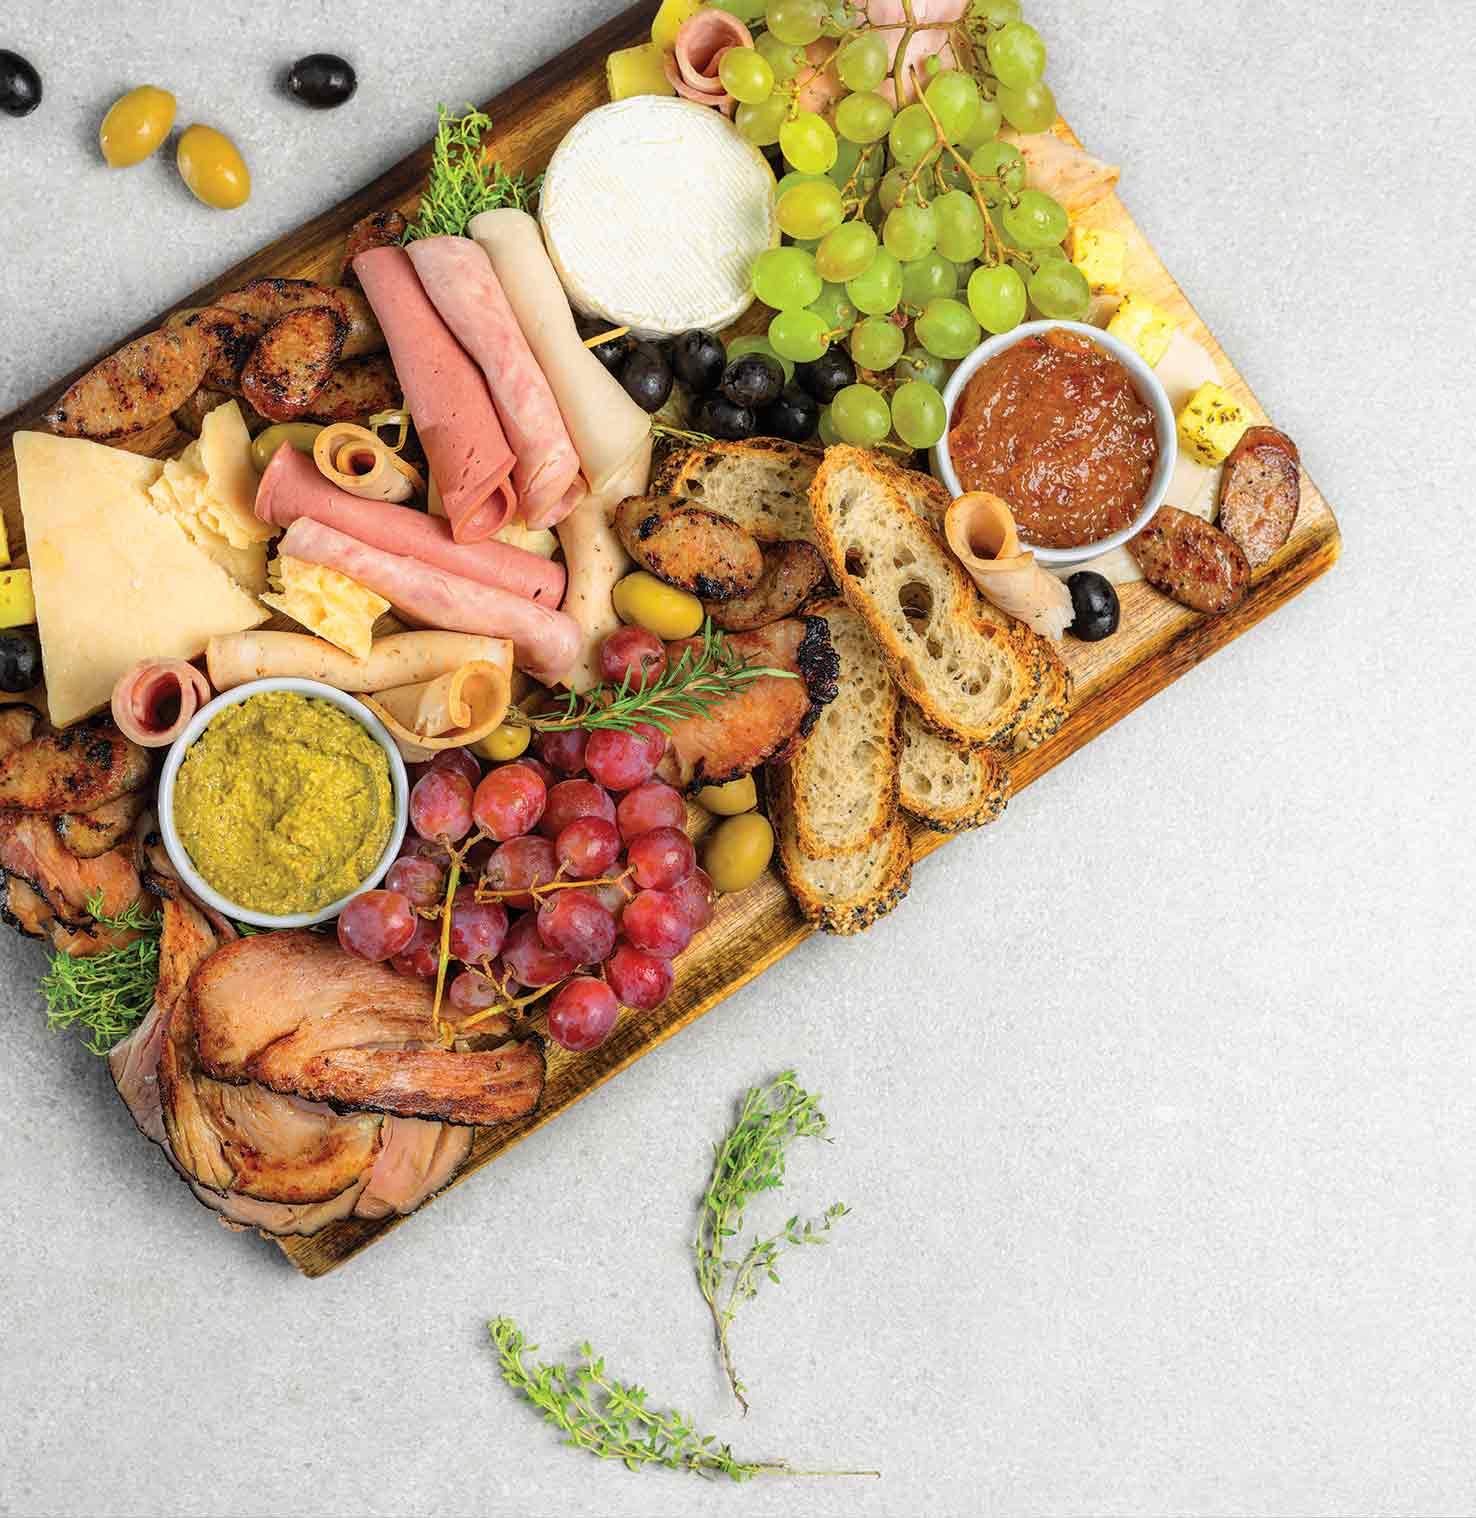 Deli Slices & Cheese Platter